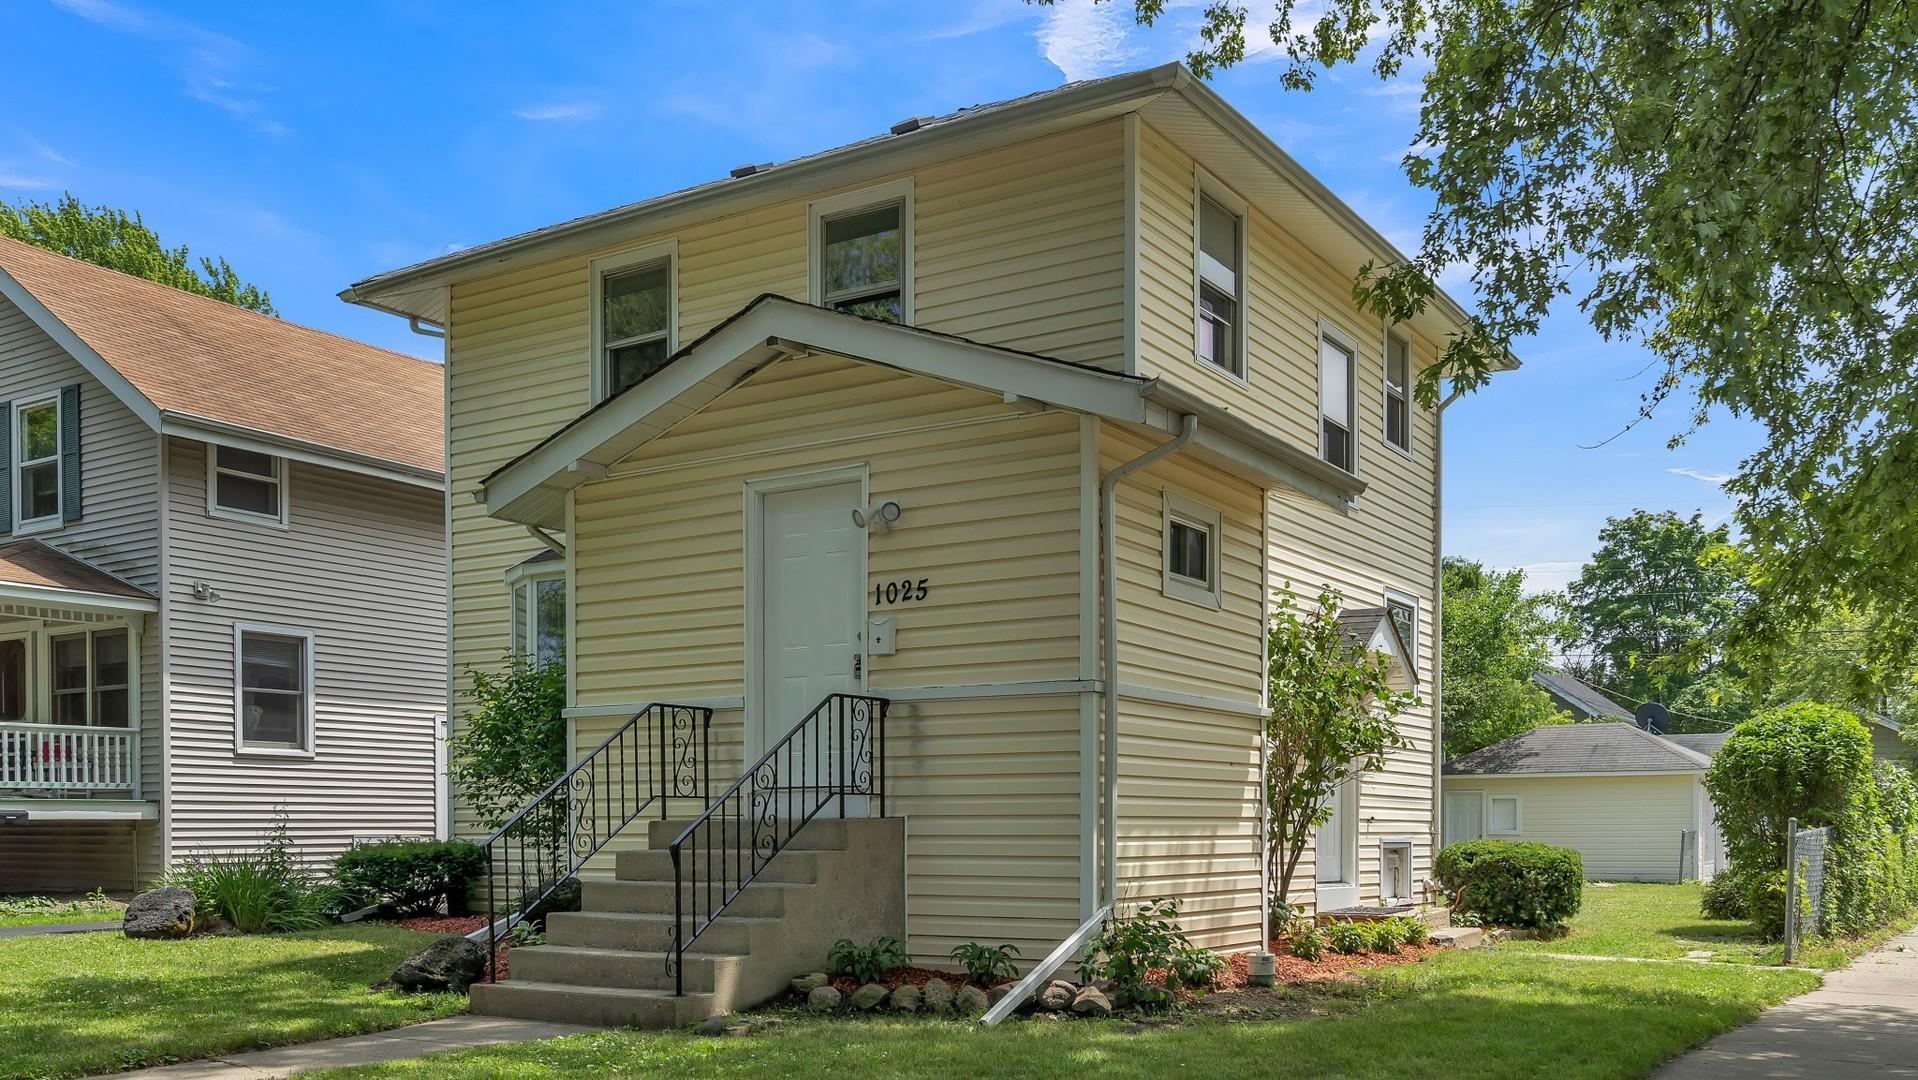 1025 Woodlawn Avenue, Waukegan IL 60085